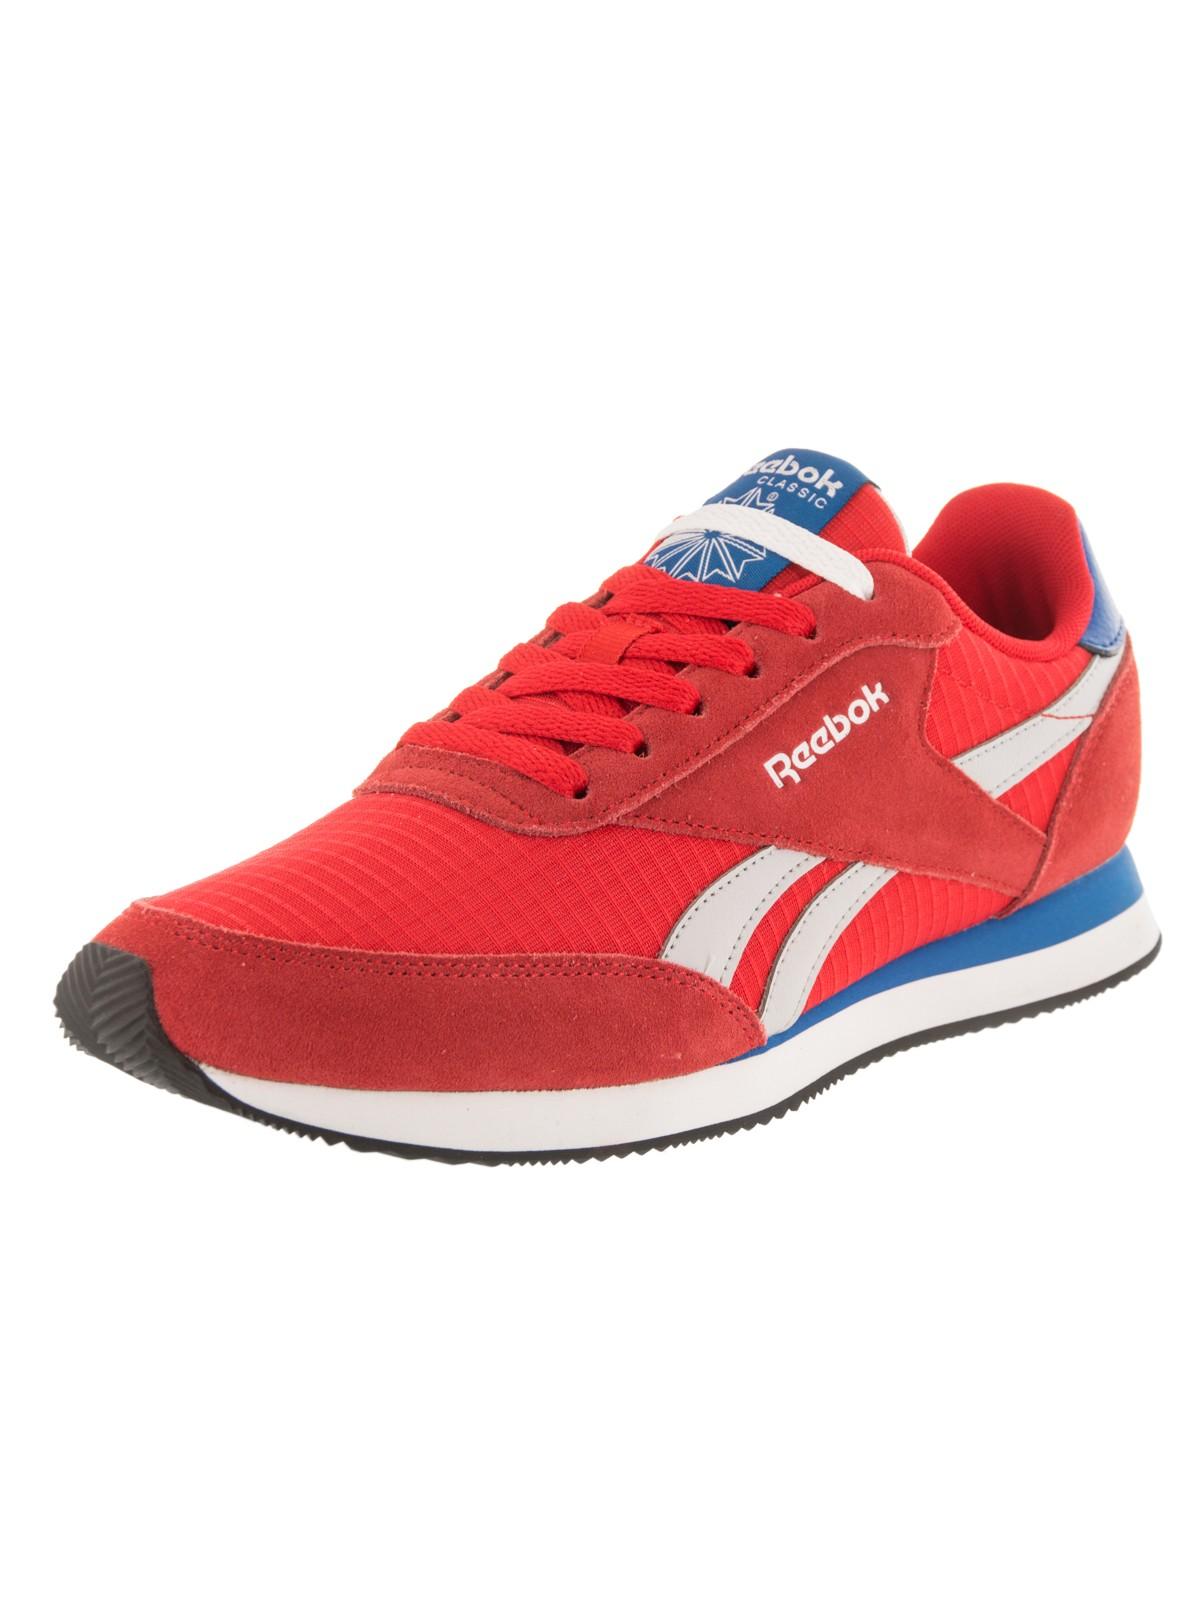 Reebok Men's Classic Jogger 2 Lifestyle Shoe